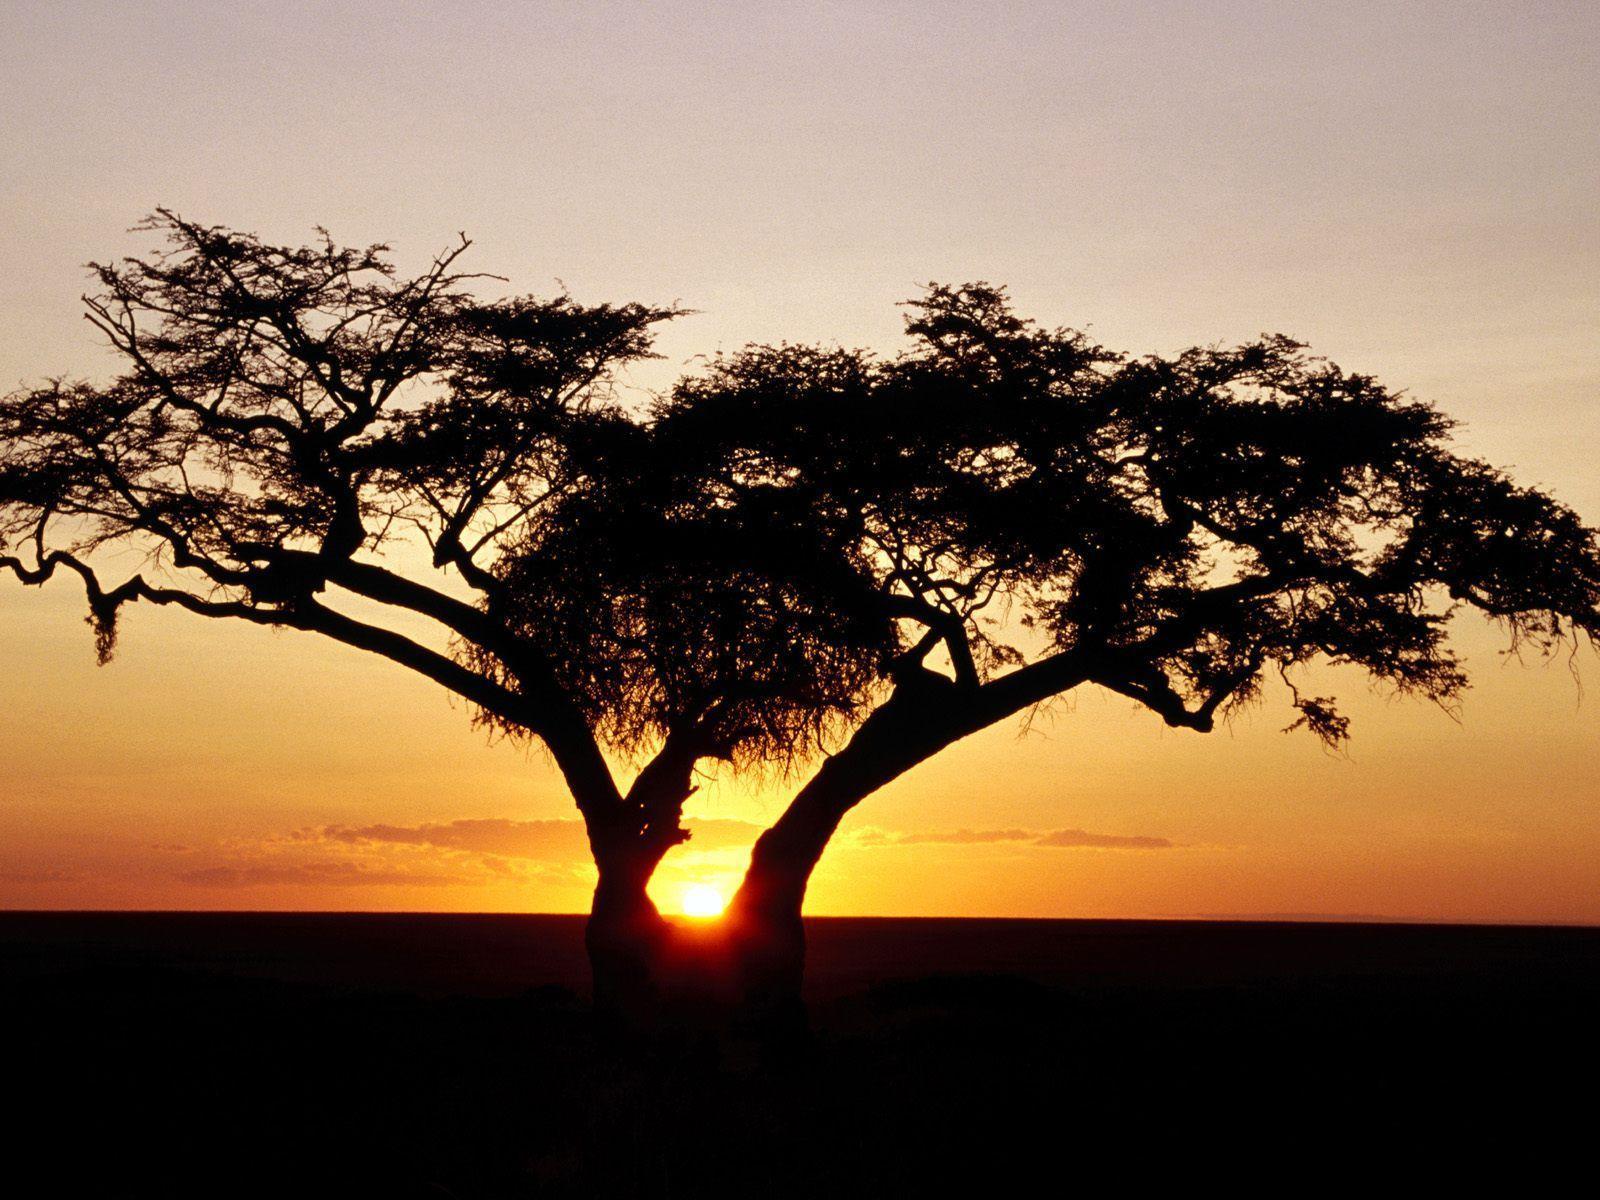 Download Africa 514 1600x1200 px High Resolution Wallpaper ...